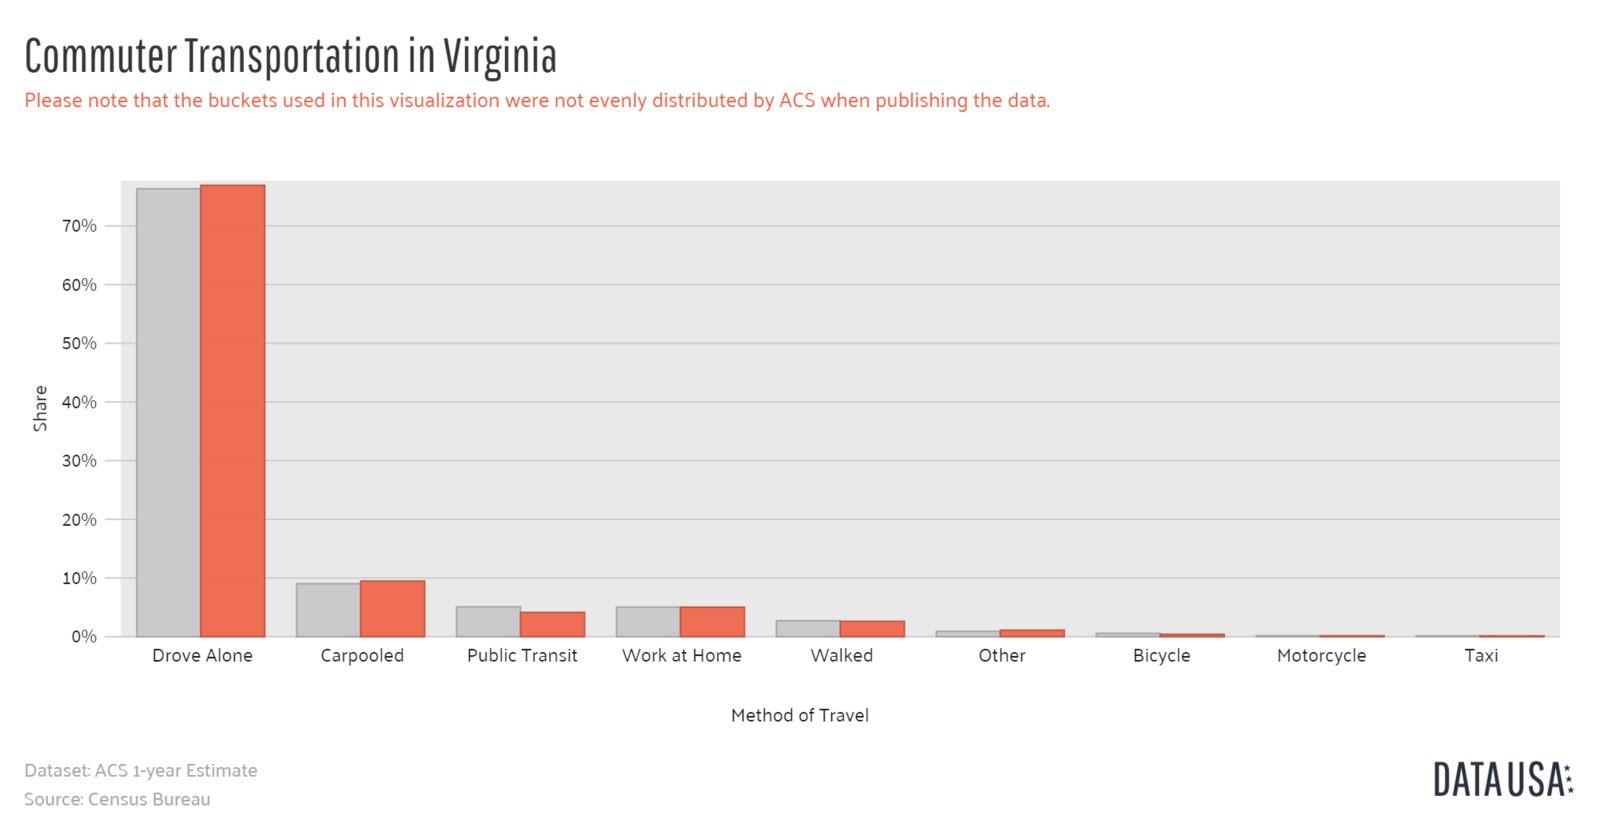 Data USA - Bar Chart of Commuter Transportation in Virginia-1600x1600